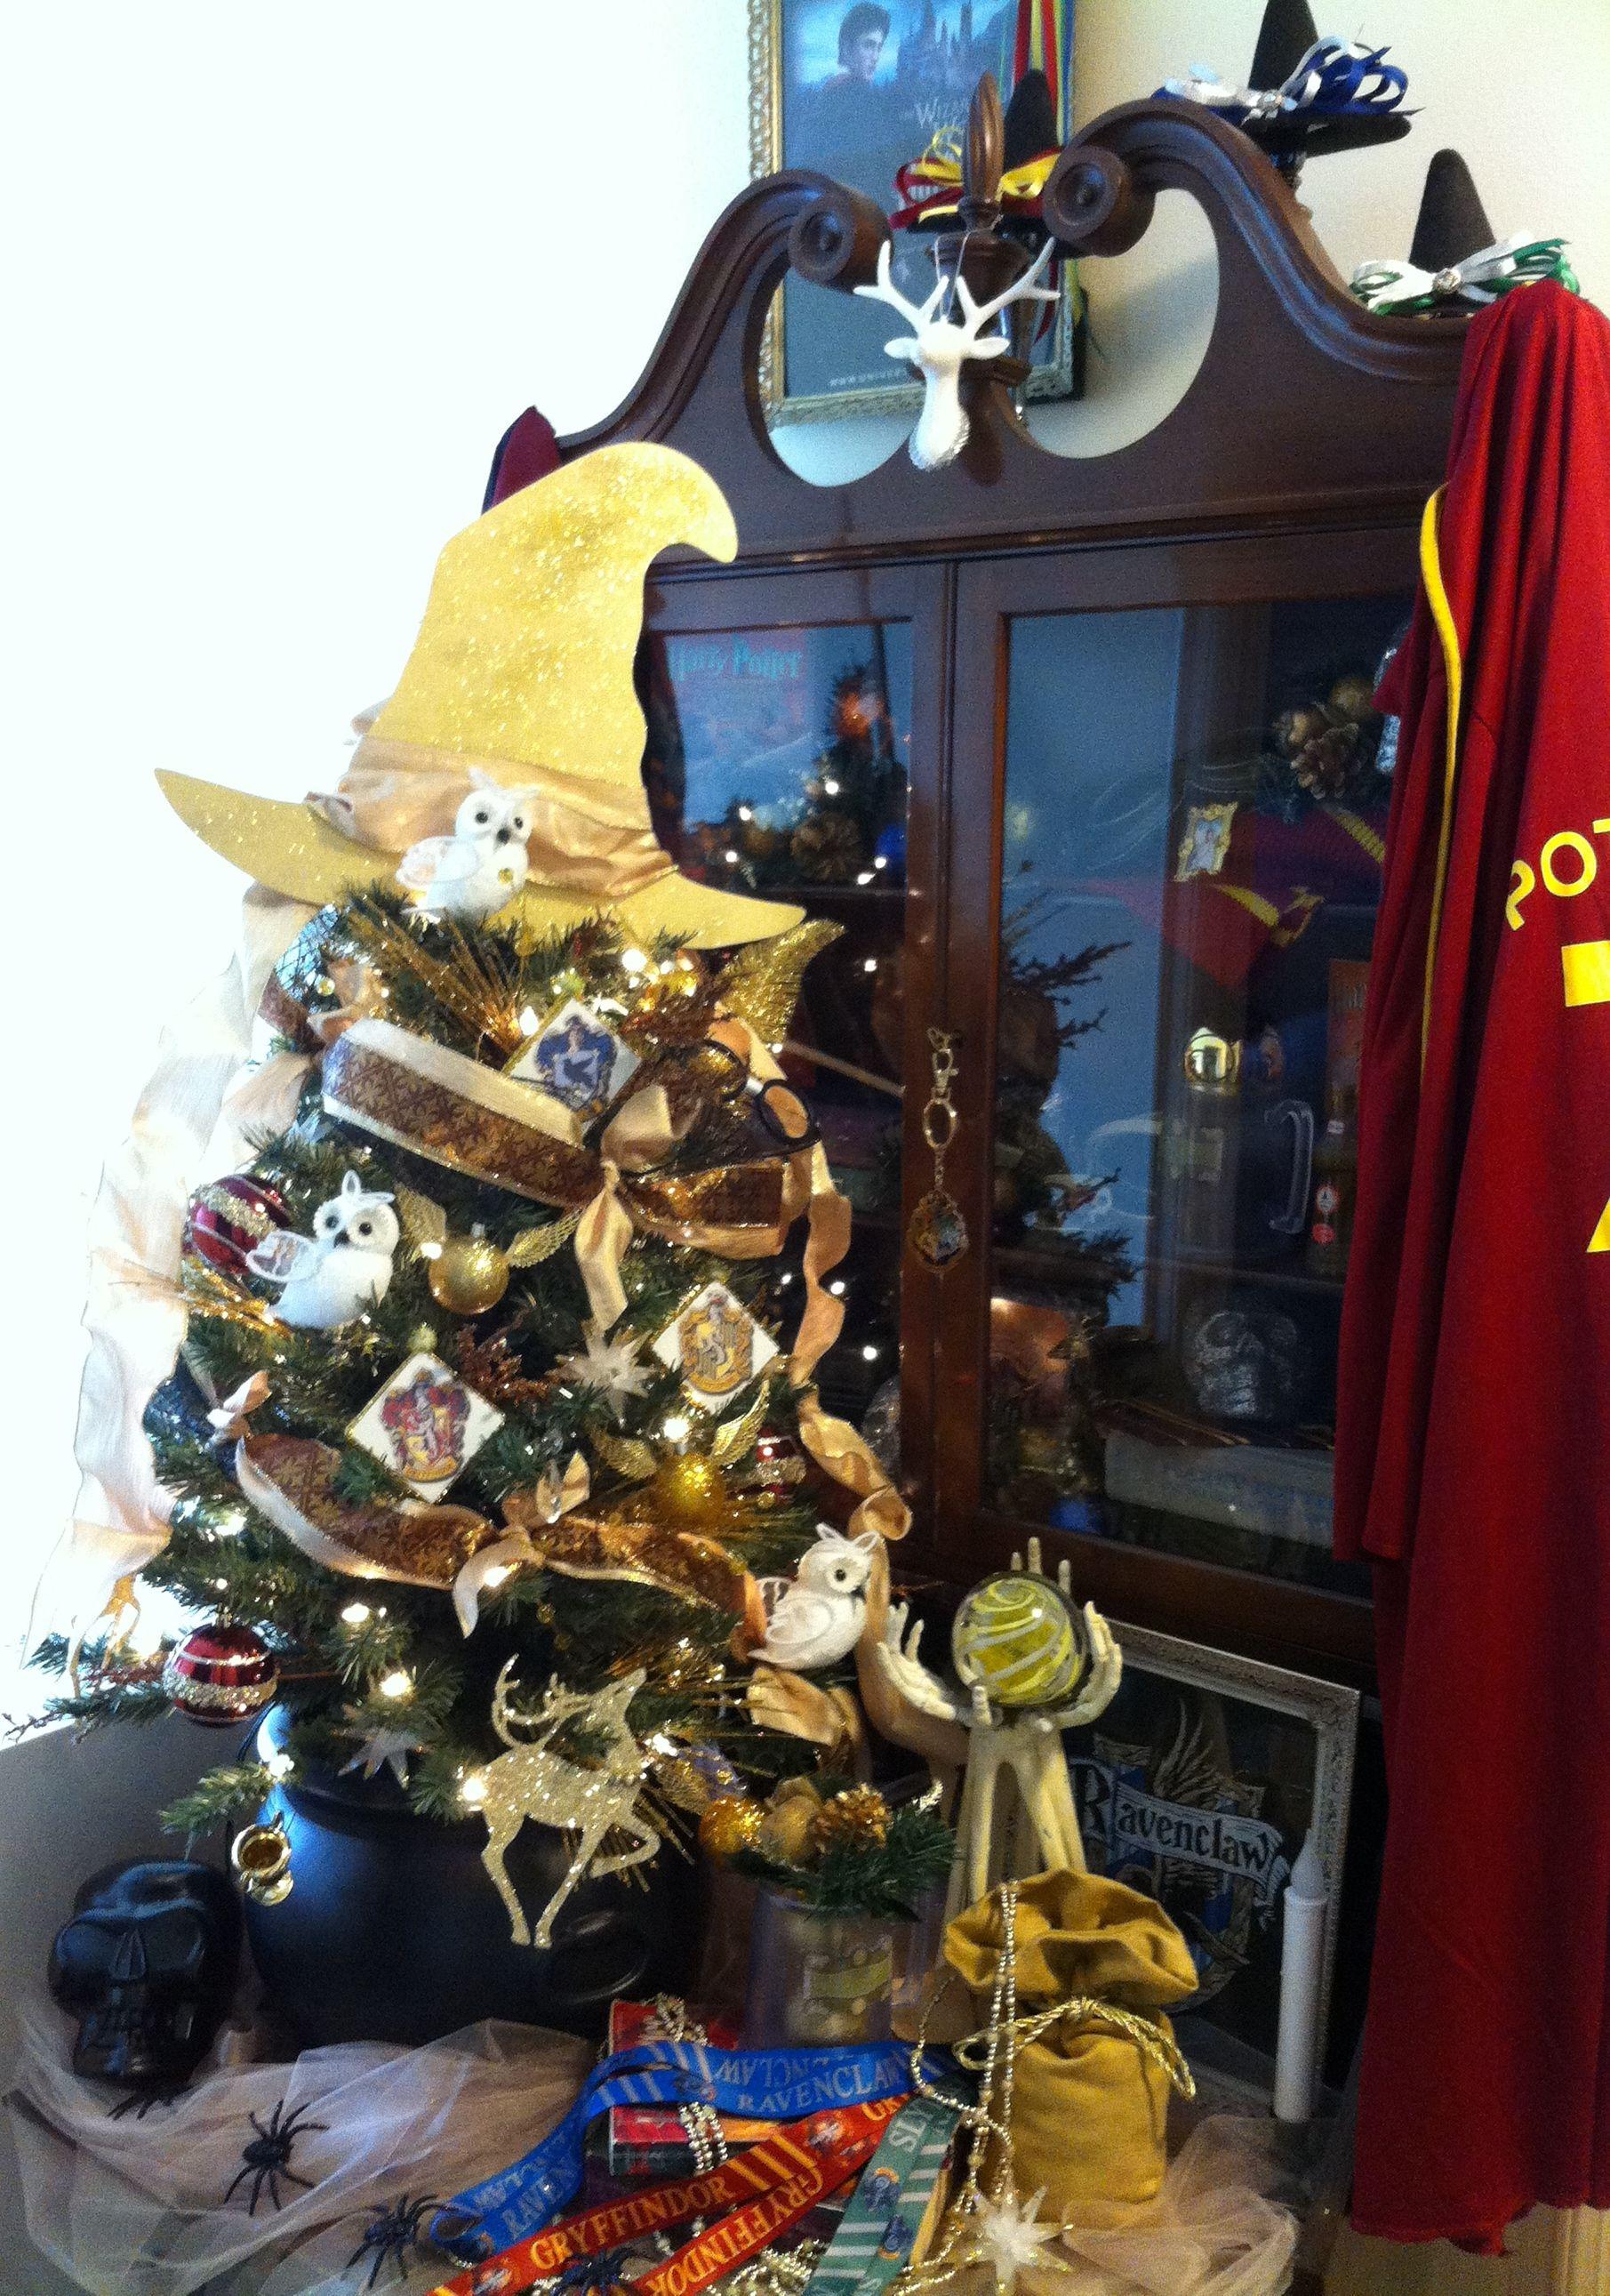 Harry Potter Tree made for Christmas 2015, Teresa Adkins